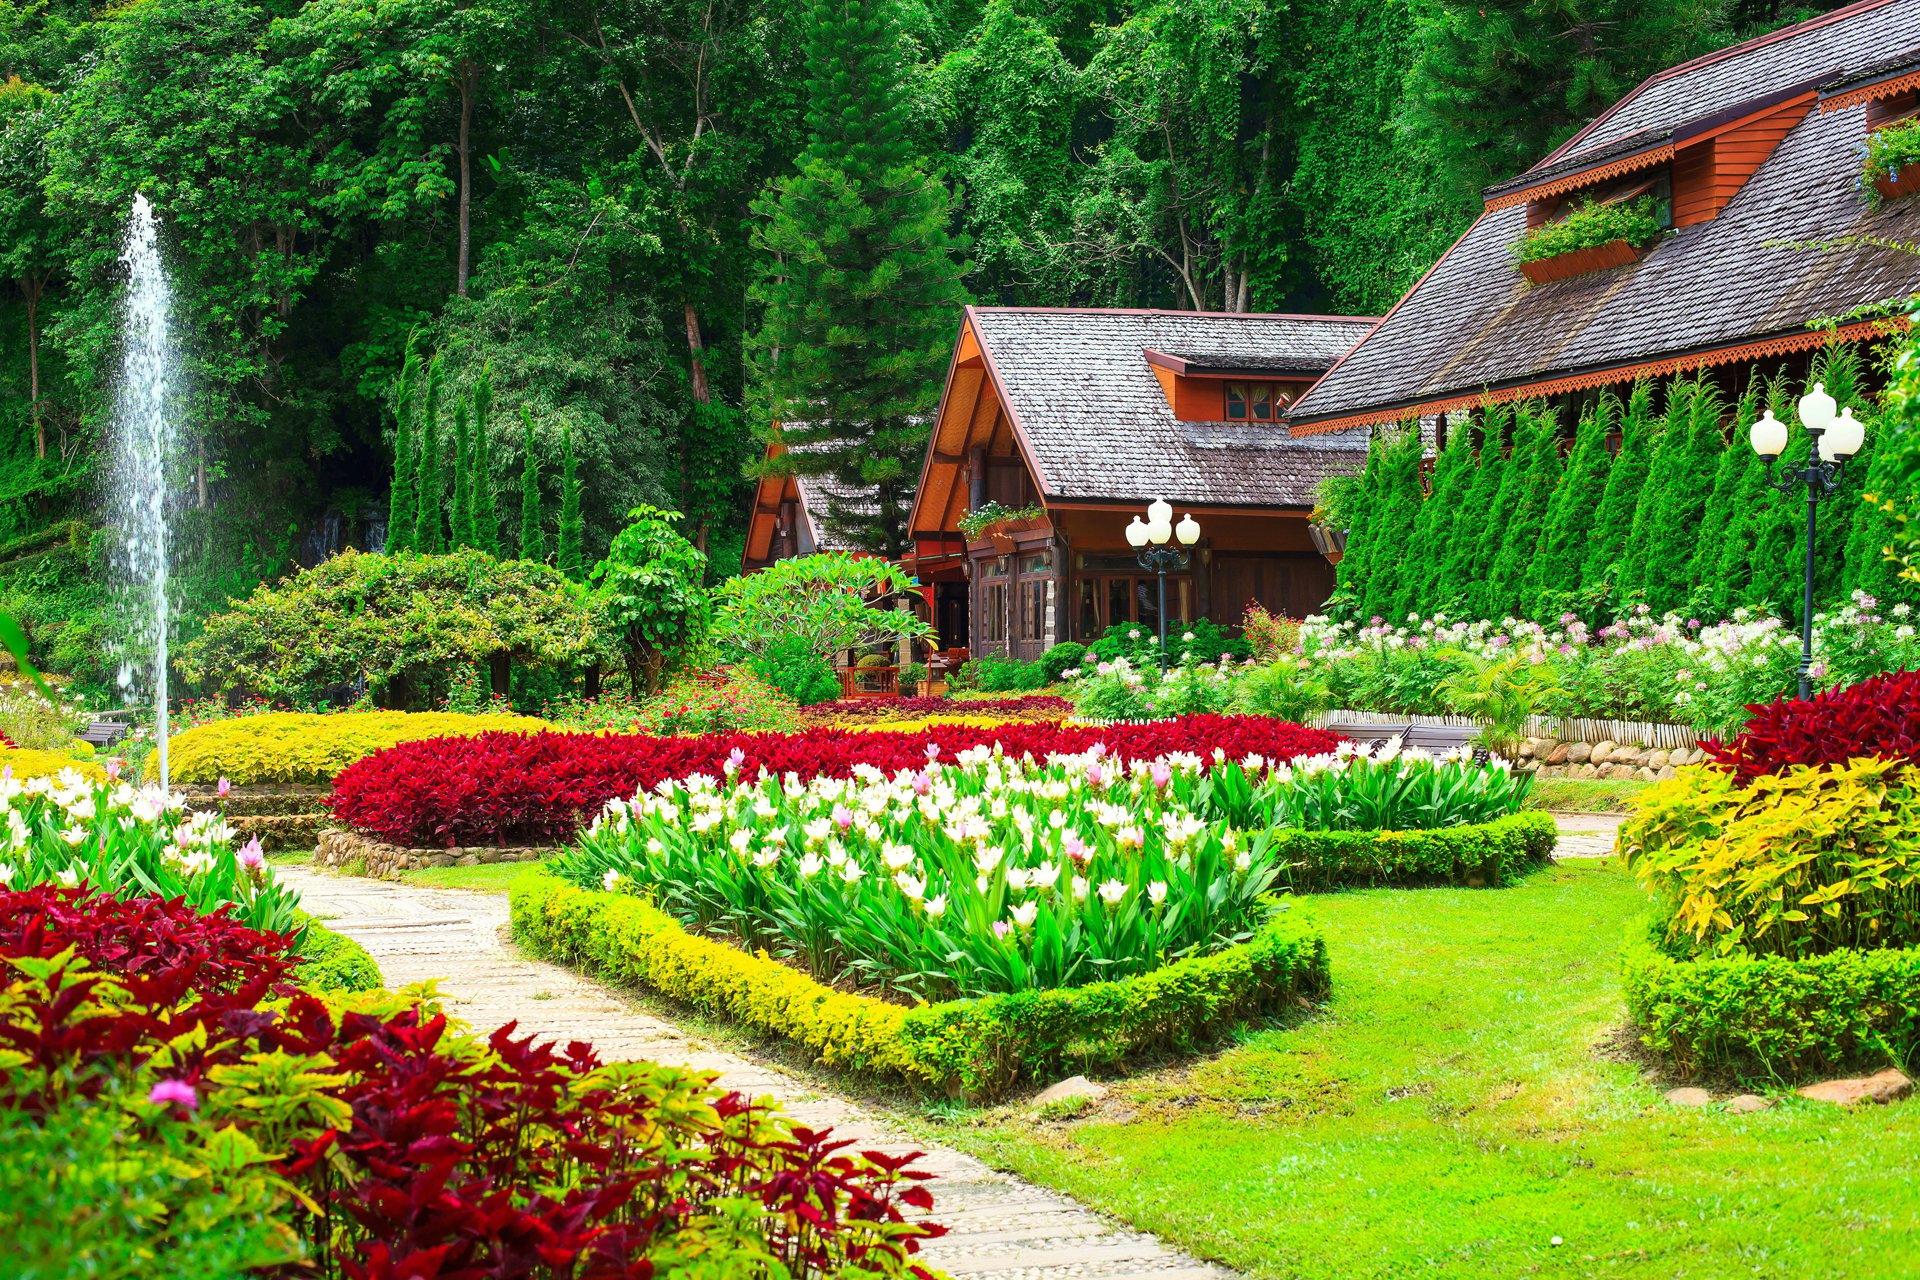 Hd garden wallpaper wallpapersafari for Garden images